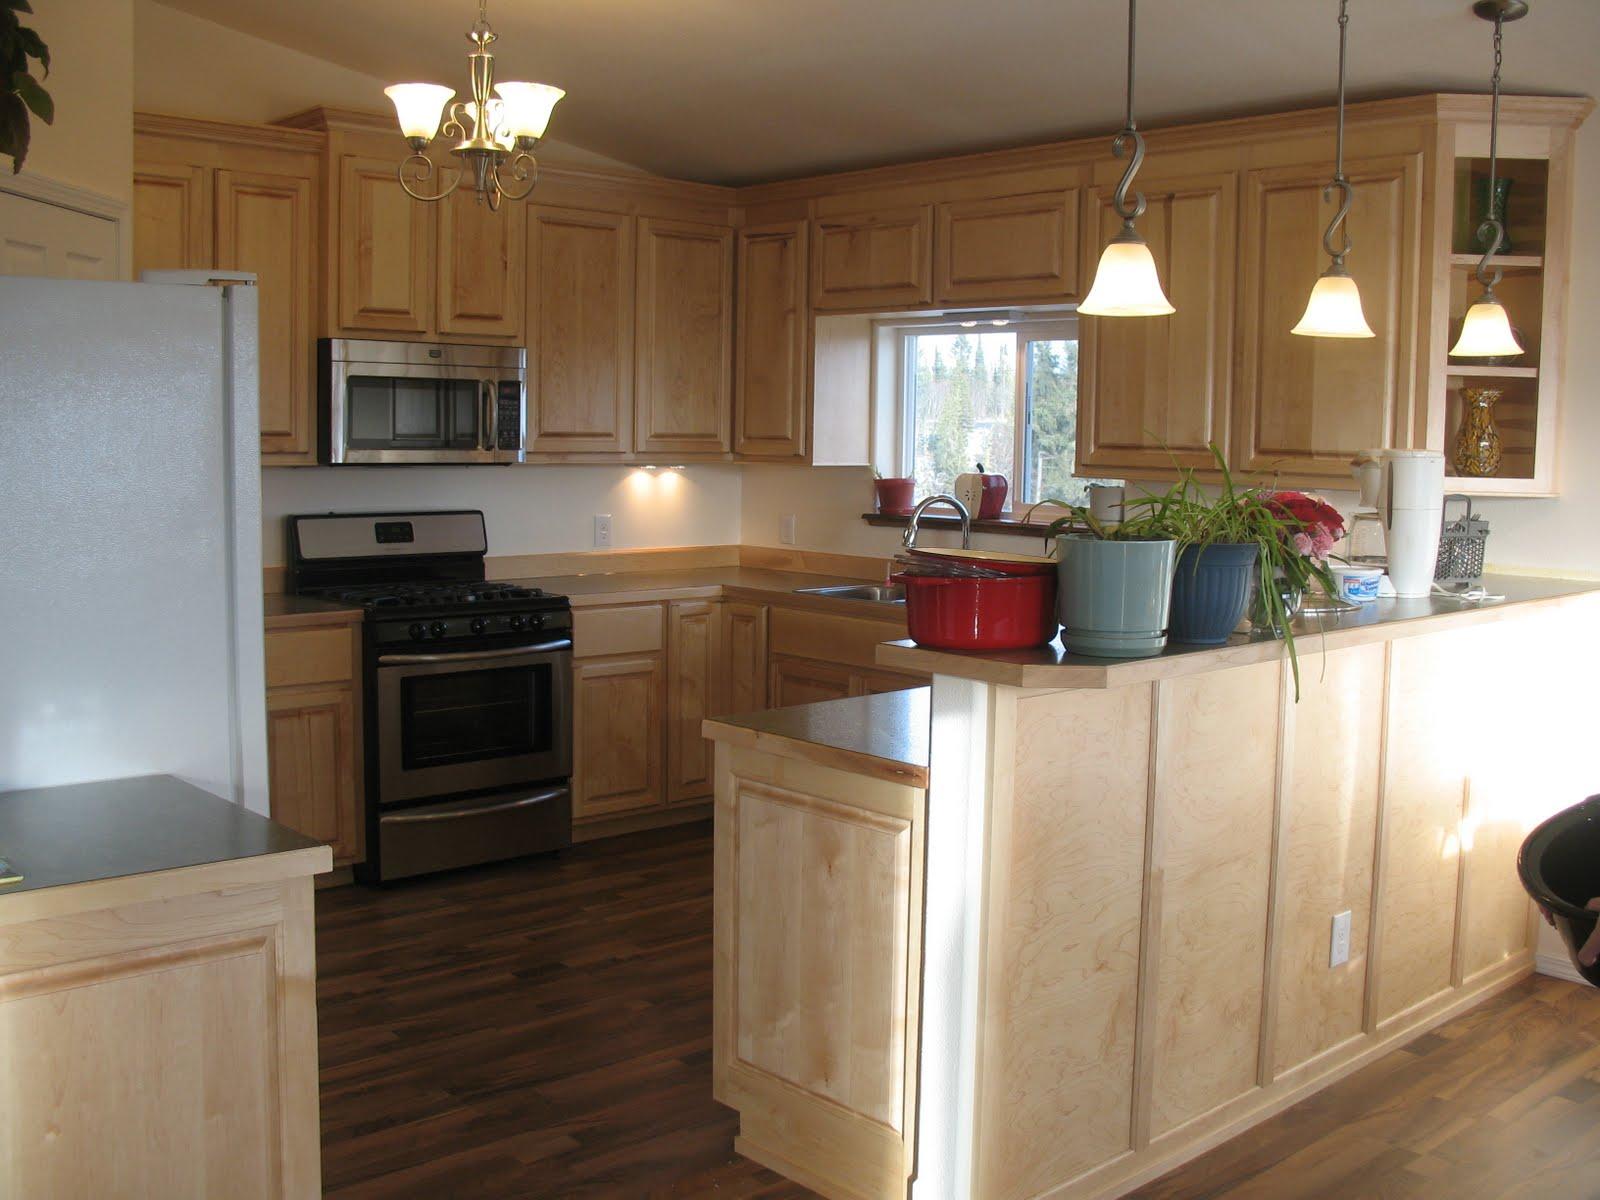 depressioneradesigns: Maple Kitchen Cabinets on Maple Cabinet Kitchen Ideas  id=19153